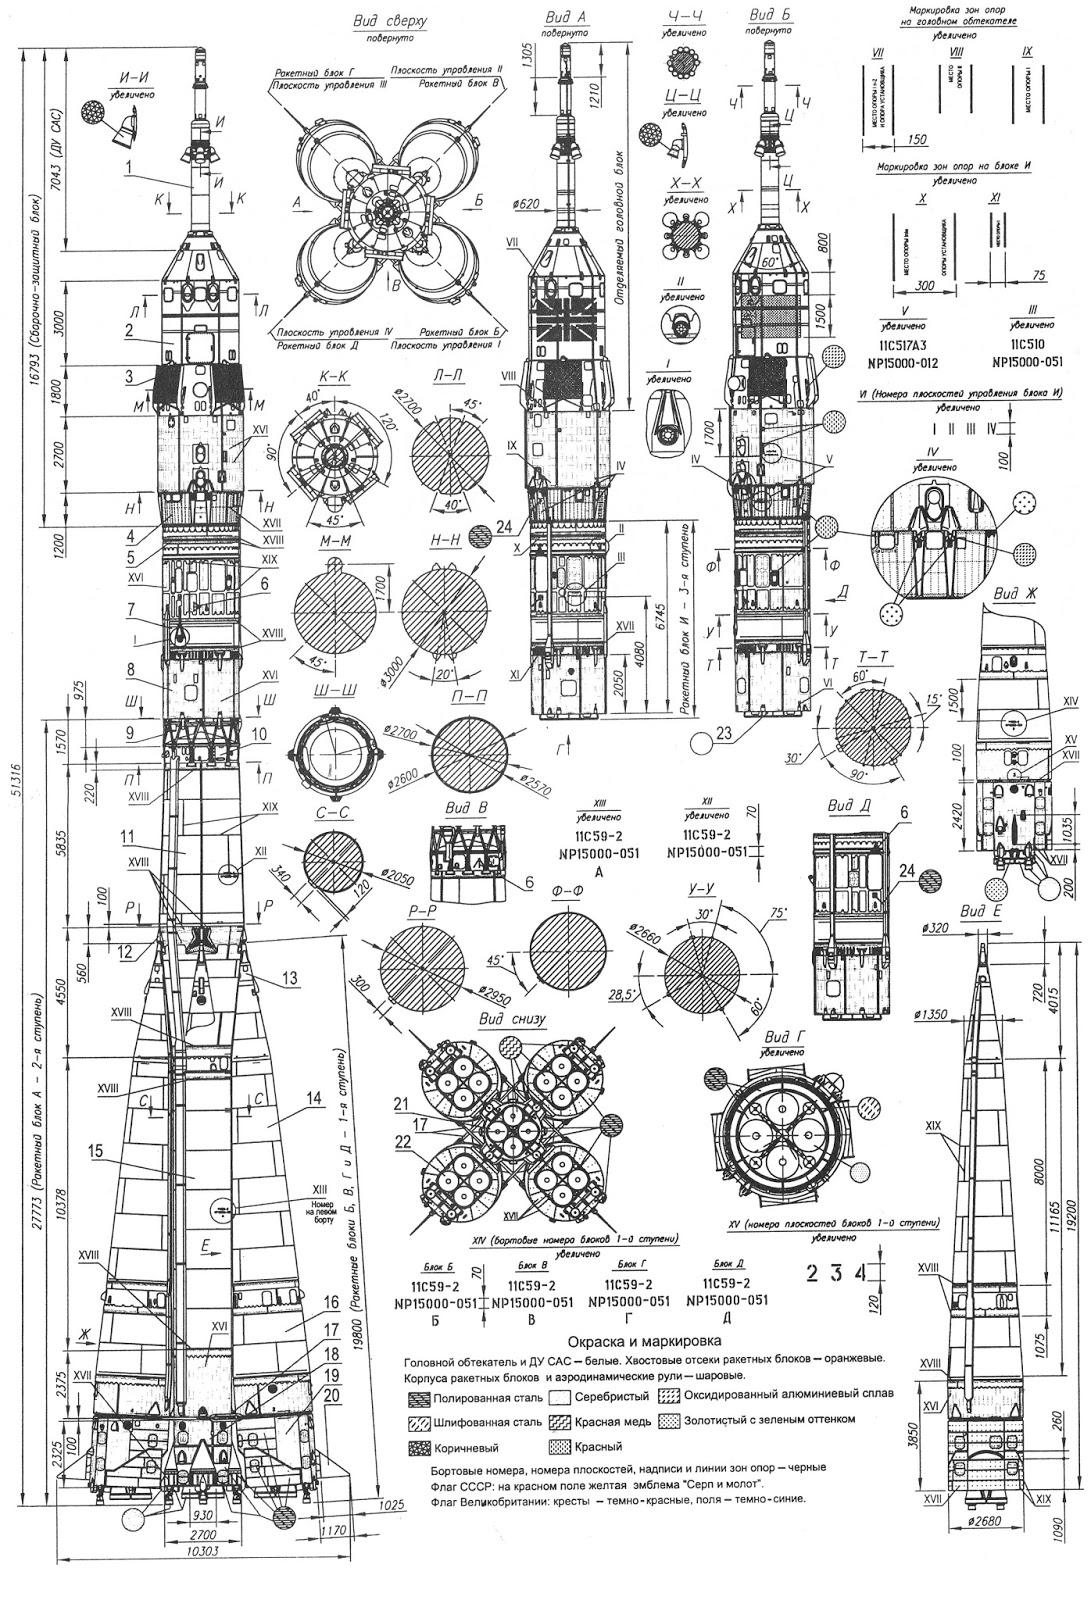 JavaFX - Rocket Blueprint